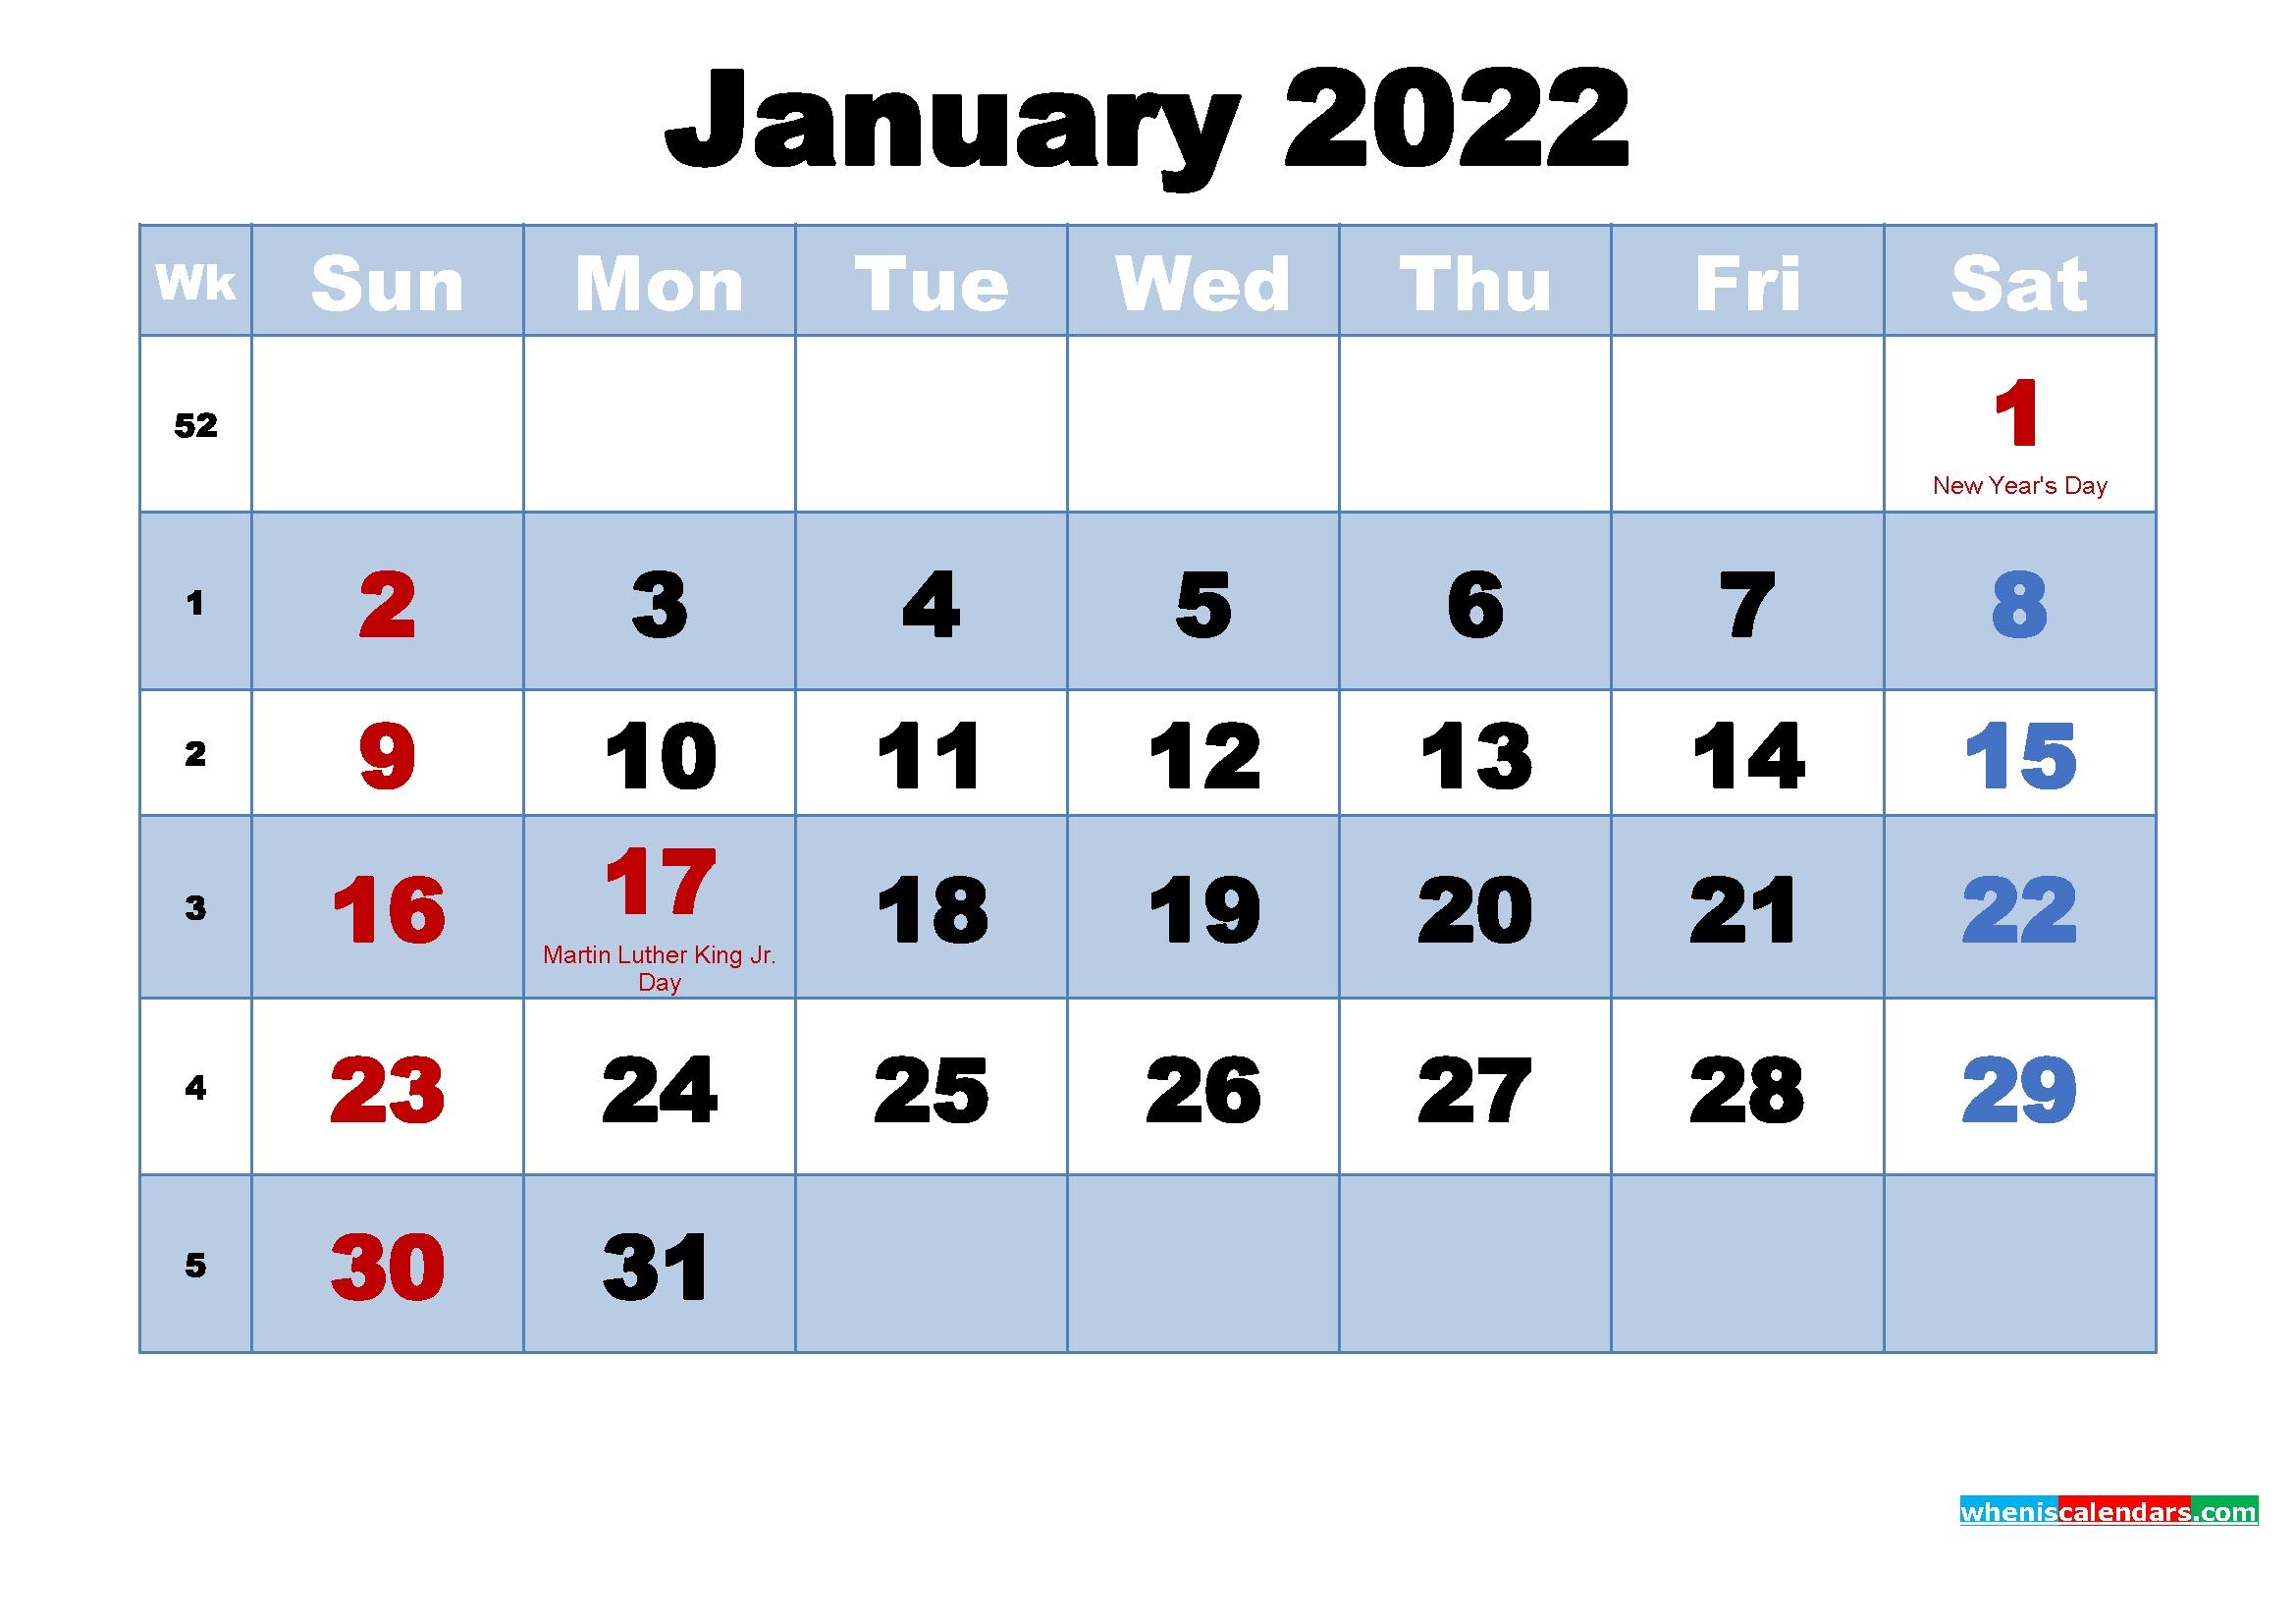 january 2022 calendar with holidays printable free printable 2020 calendar with holidays::January 2022 Calendar Printable Free